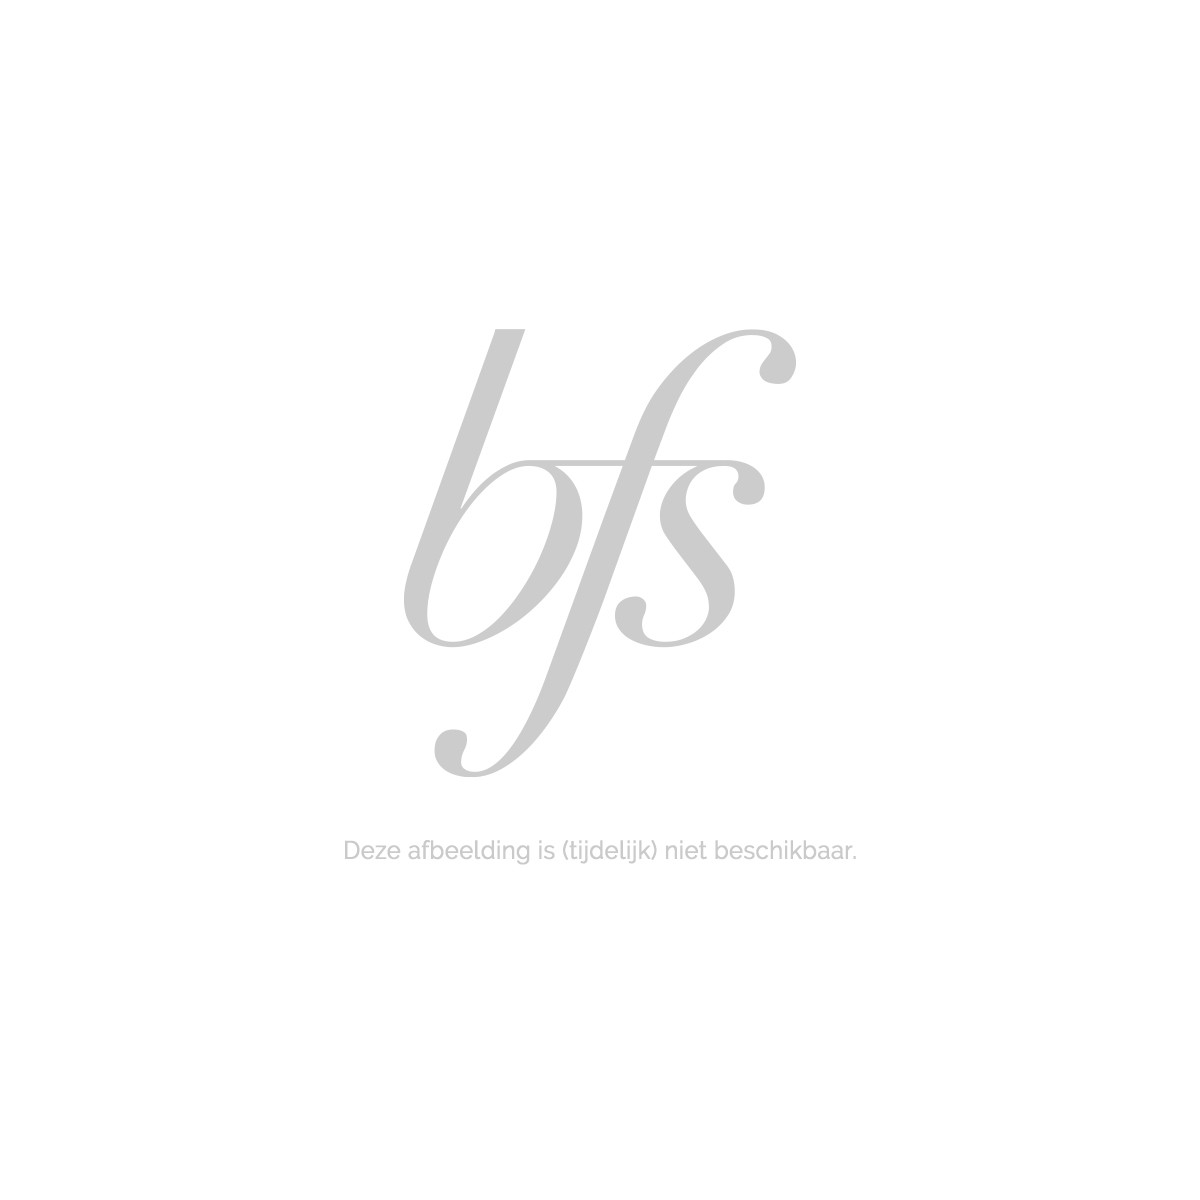 Babyliss Krultang Titanium Tourmaline Ceramic 32Mm